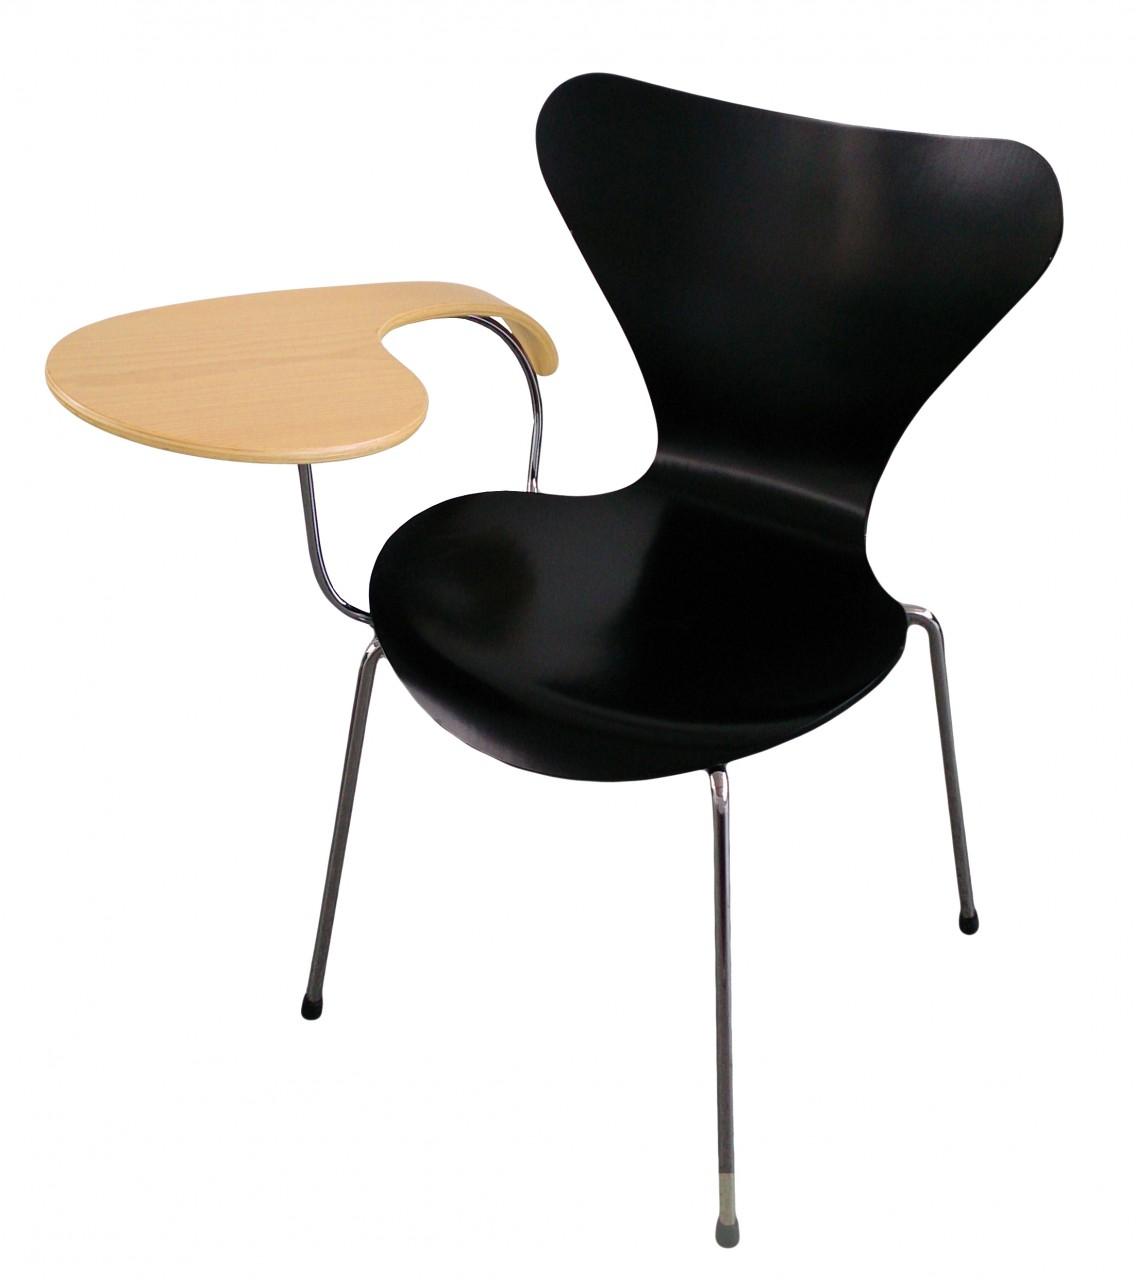 Stuhl FRITZ HANSEN 3107 mit Tablar